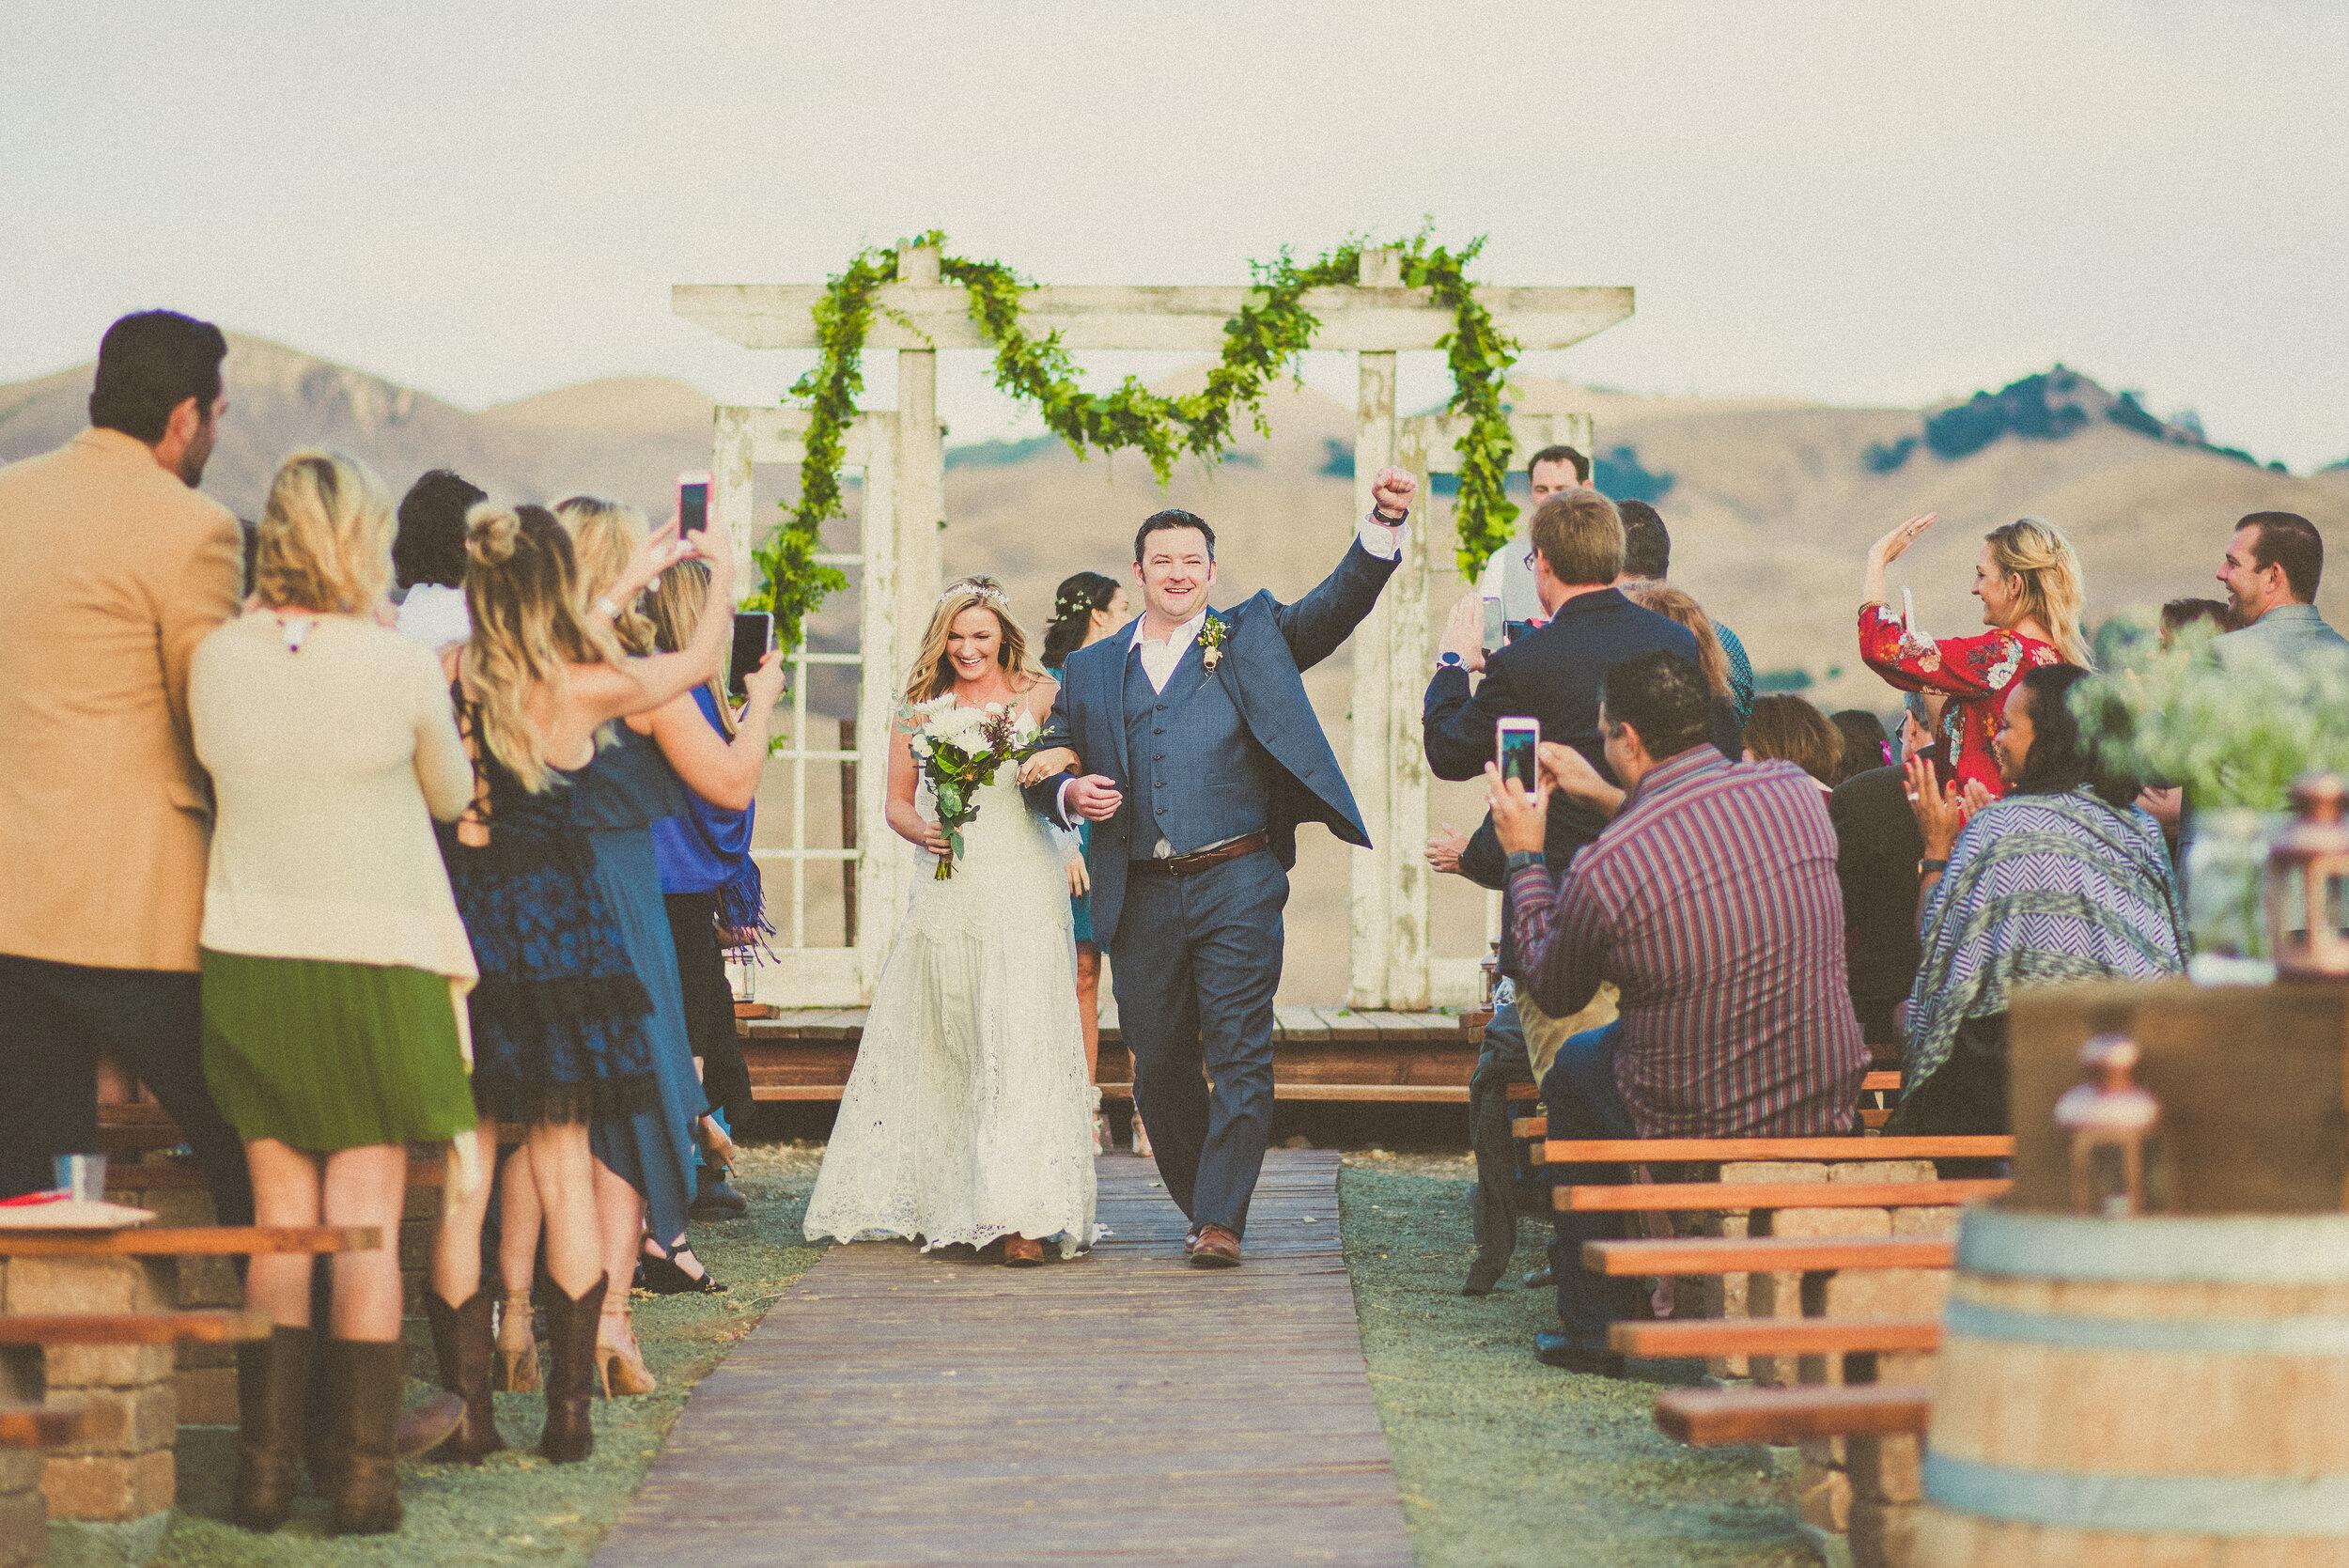 Prouty Wedding - Ceremony-75.jpg